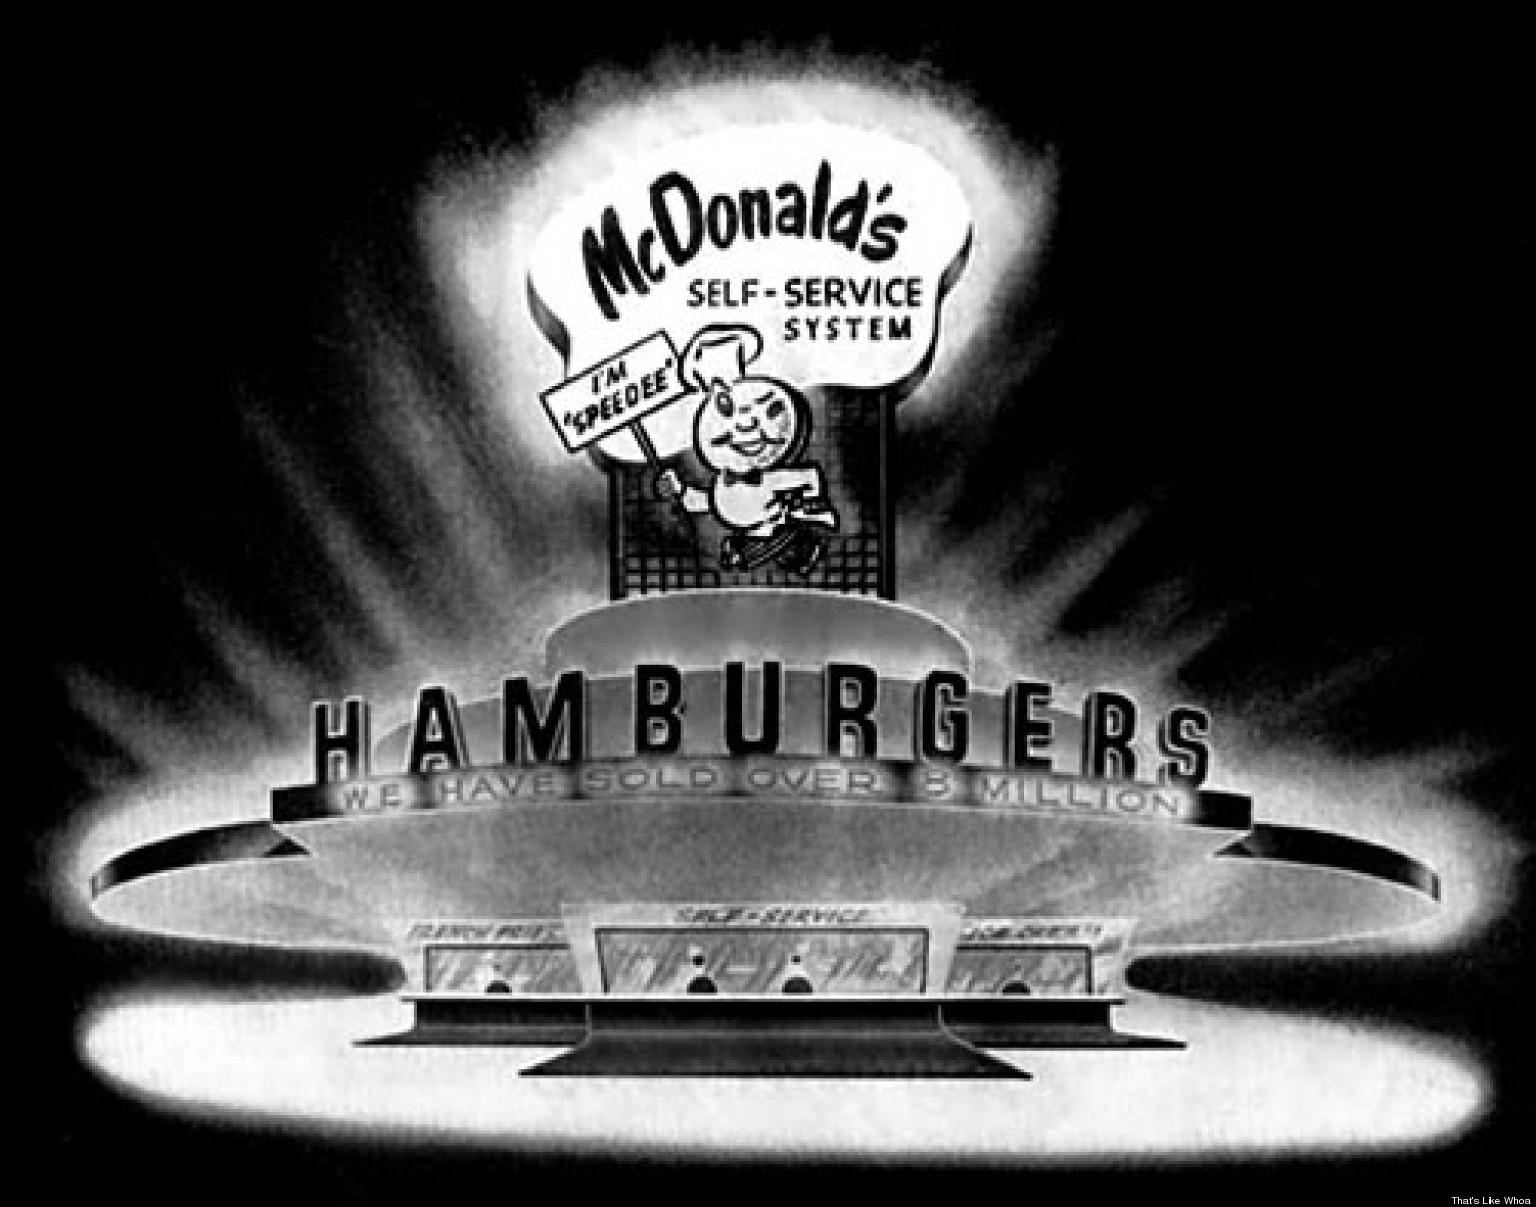 first mcdonalds 1940 - photo #15